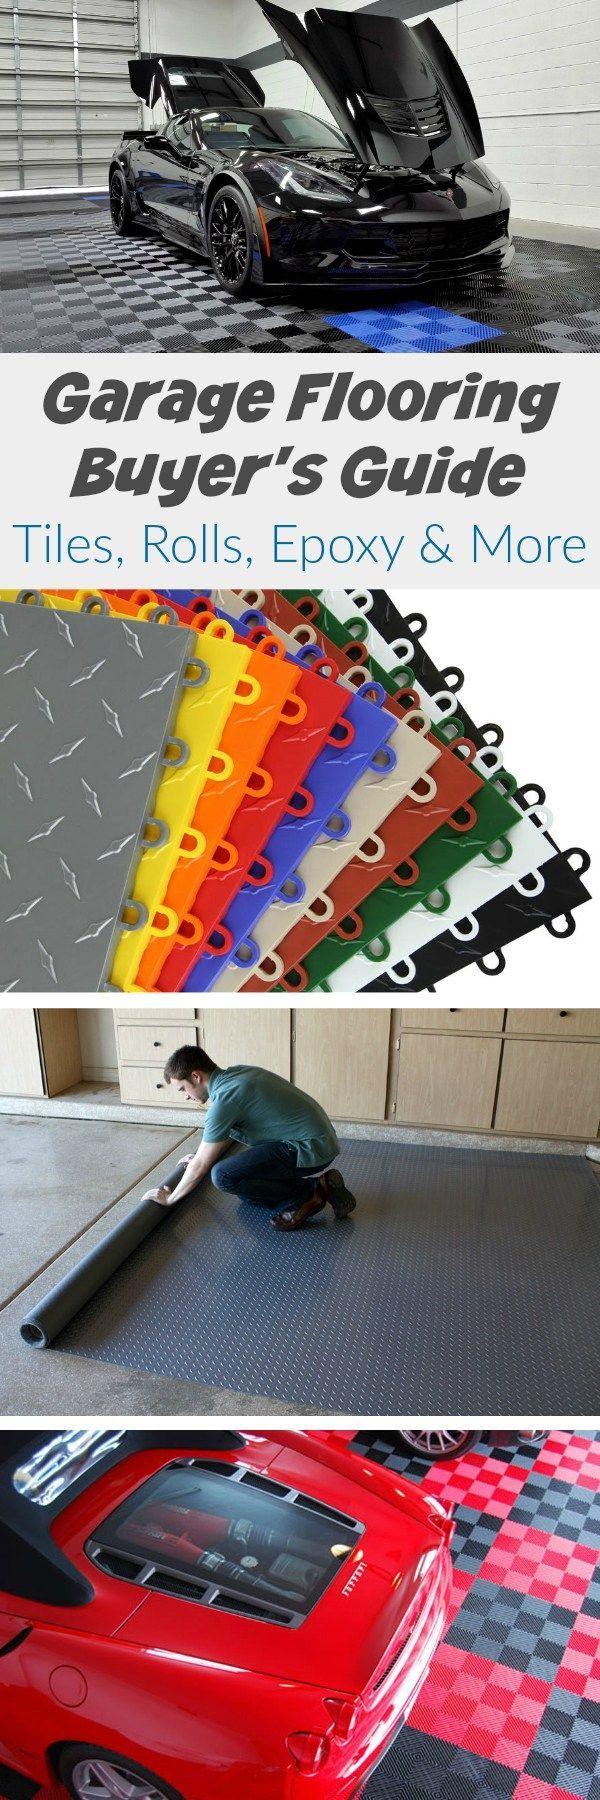 Best 25 garage floor tiles ideas on pinterest garage flooring garage flooring buyers guide tiles rolls epoxy more dailygadgetfo Choice Image